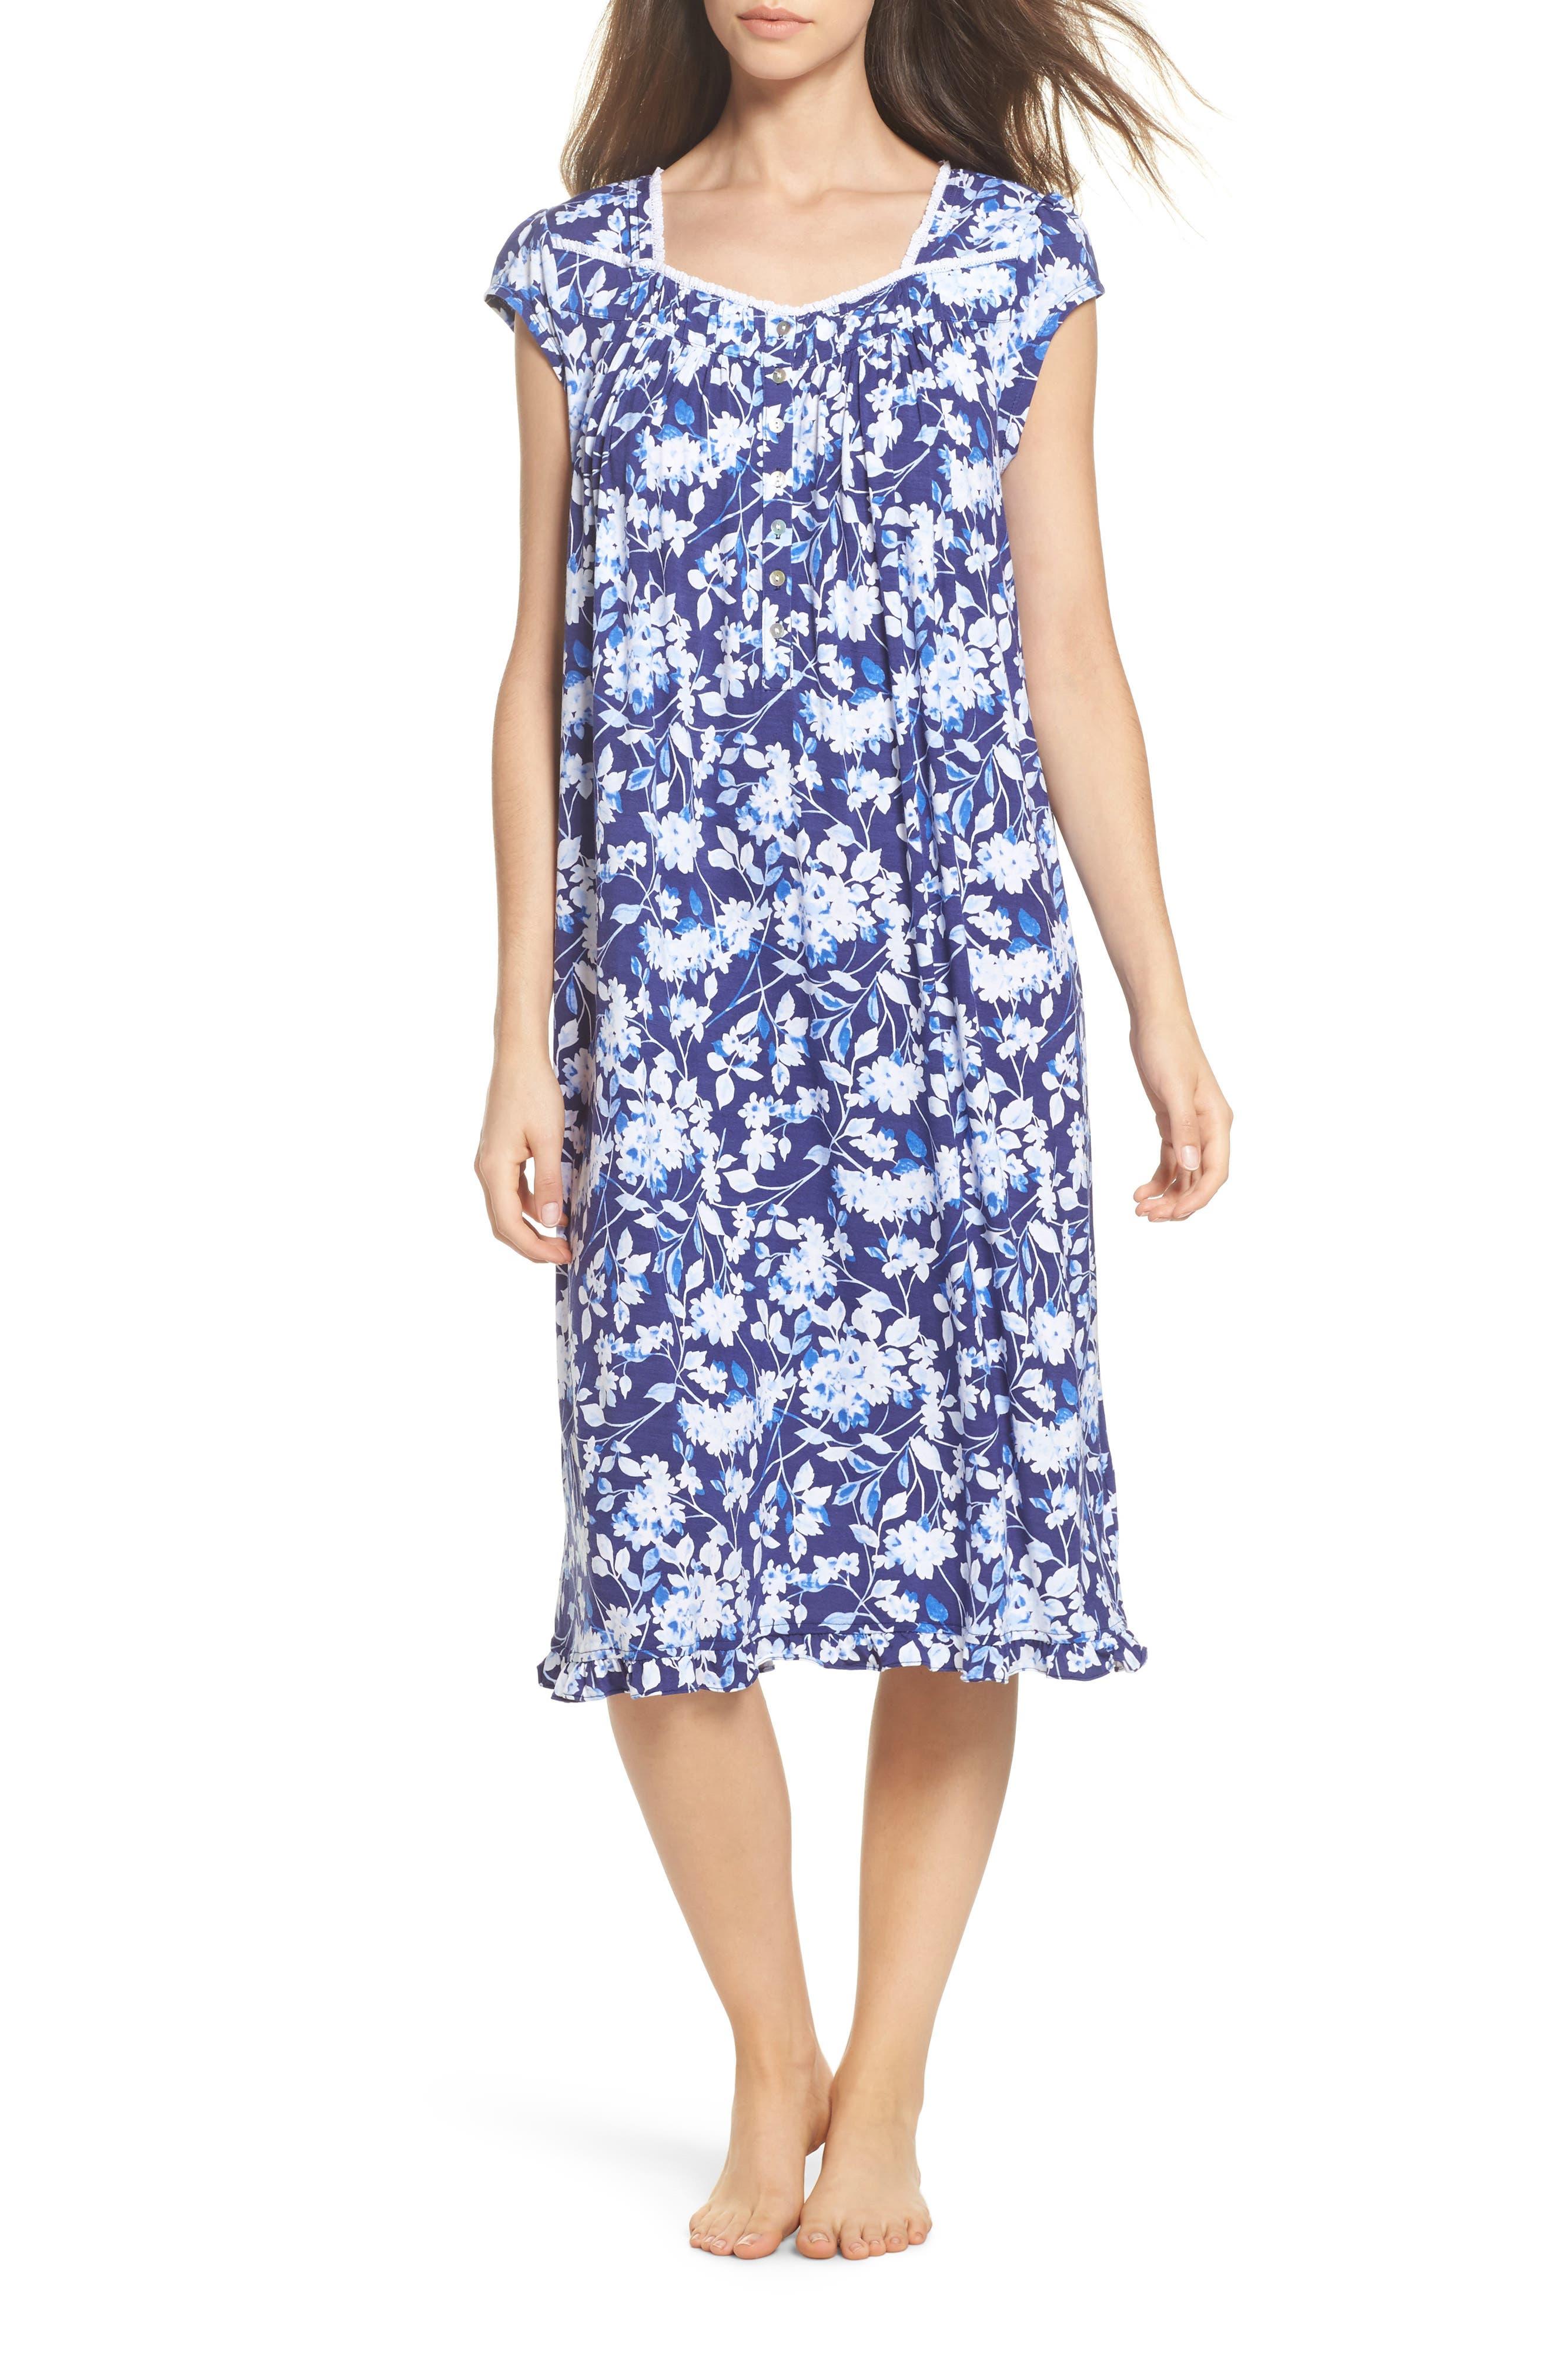 Waltz Nightgown,                         Main,                         color, Blue Multi Floral